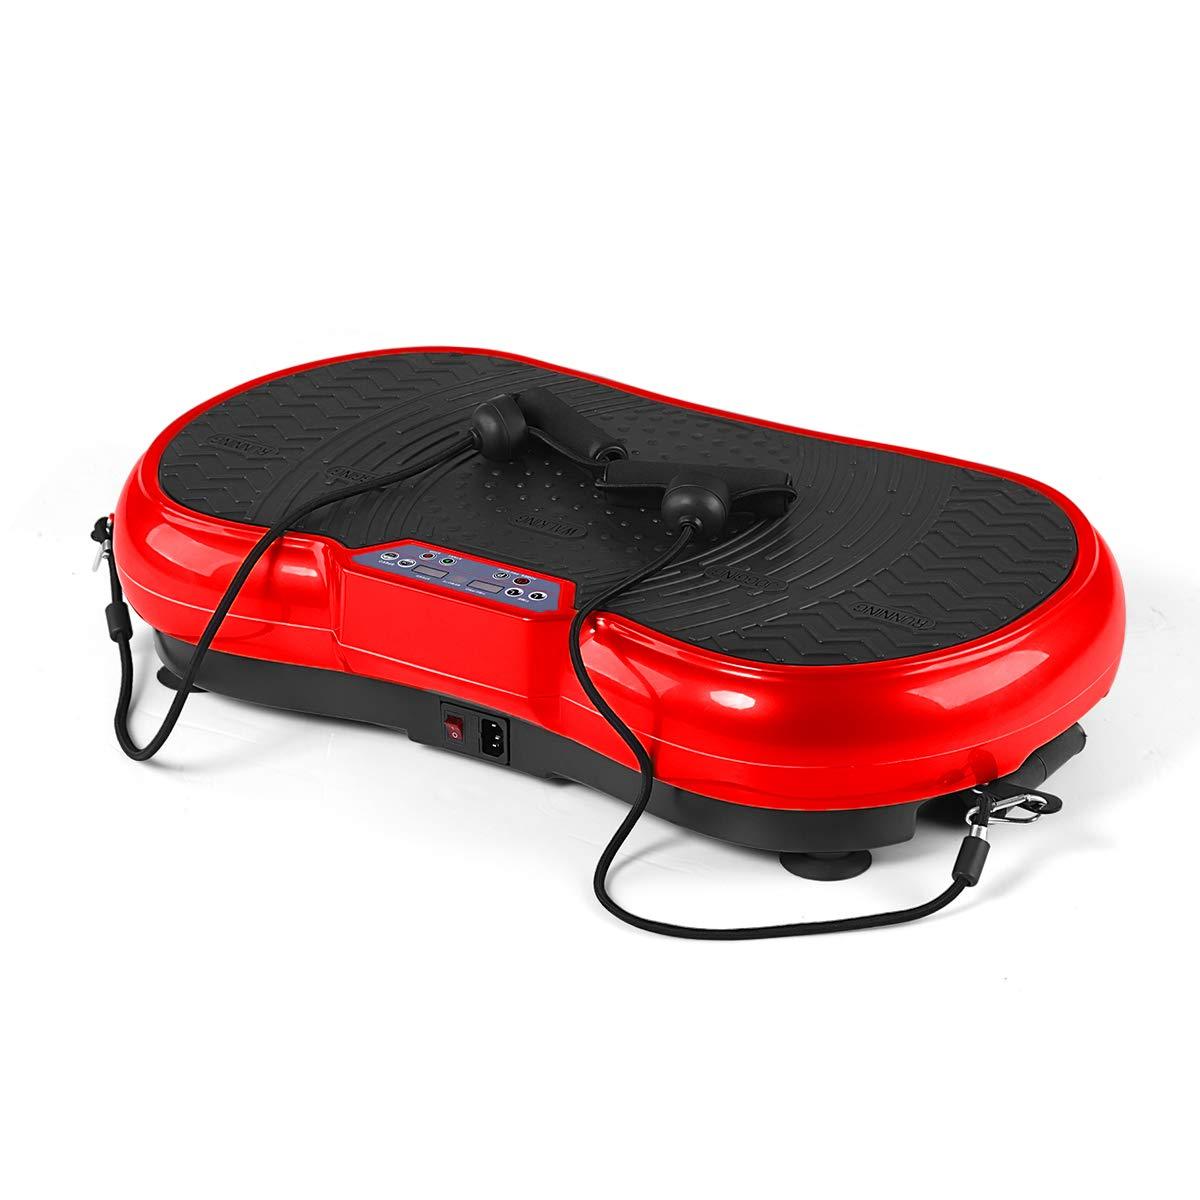 GENKI Fitness Vibration Platform Workout Machine Whole Full Body Shape Exercise Training Power Plate (Red)